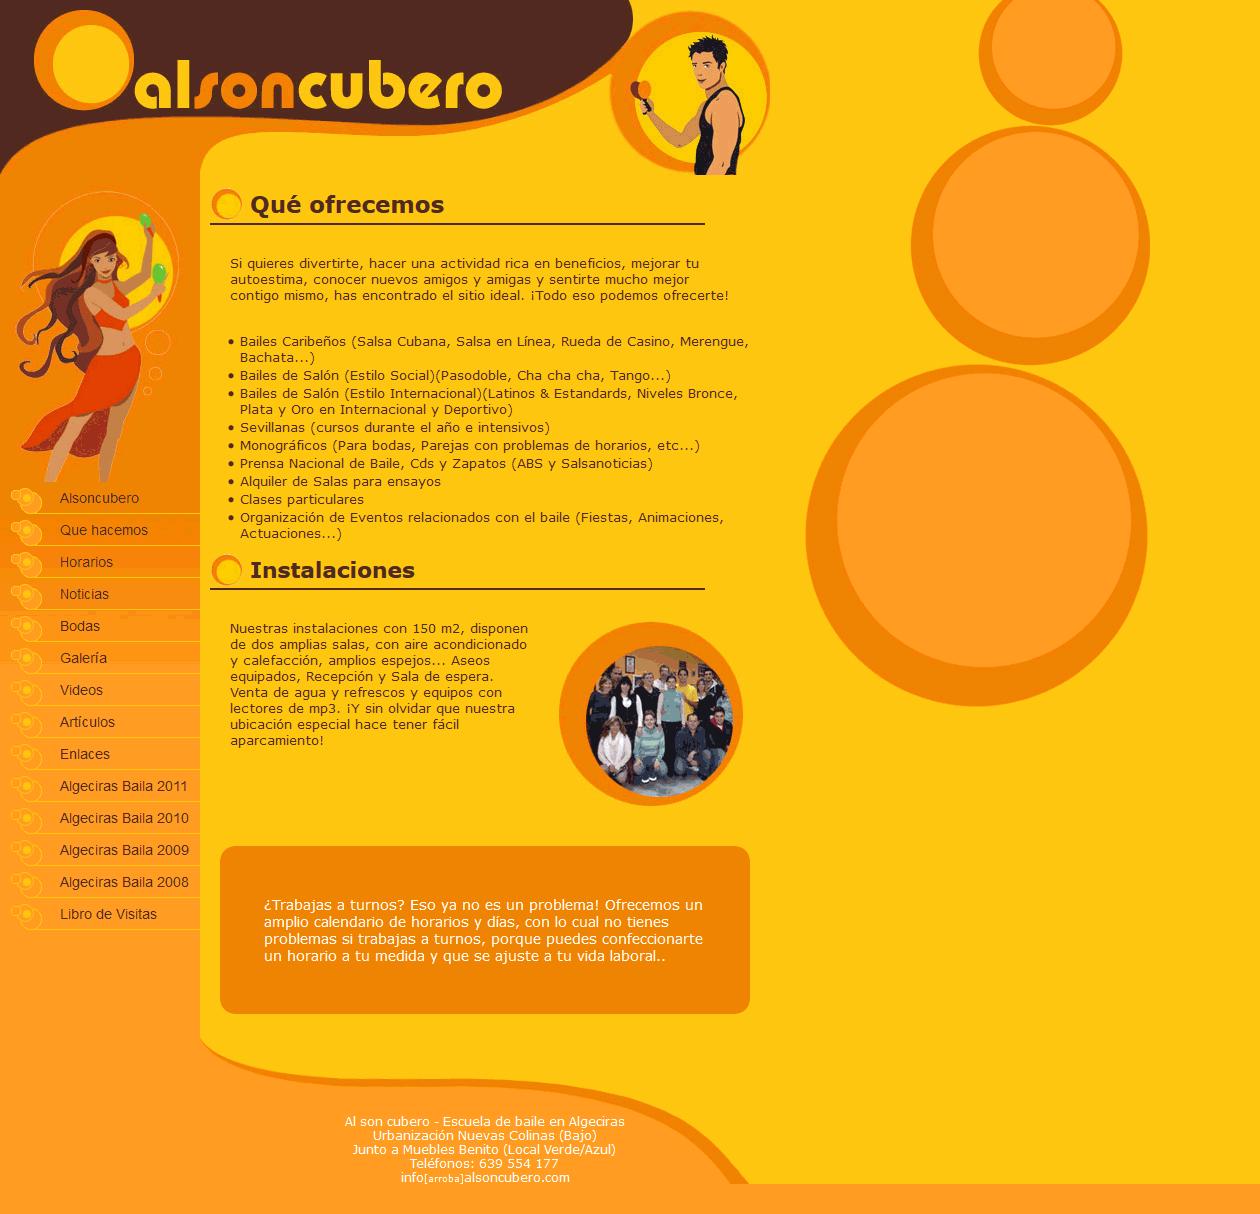 Alsoncubero - Escuela de Baile en Algeciras. Xhtml 1.0 Strict, Css, Javascript, Jquery, Php, Mysql, Dreamweaver, Photoshop. Año 2007